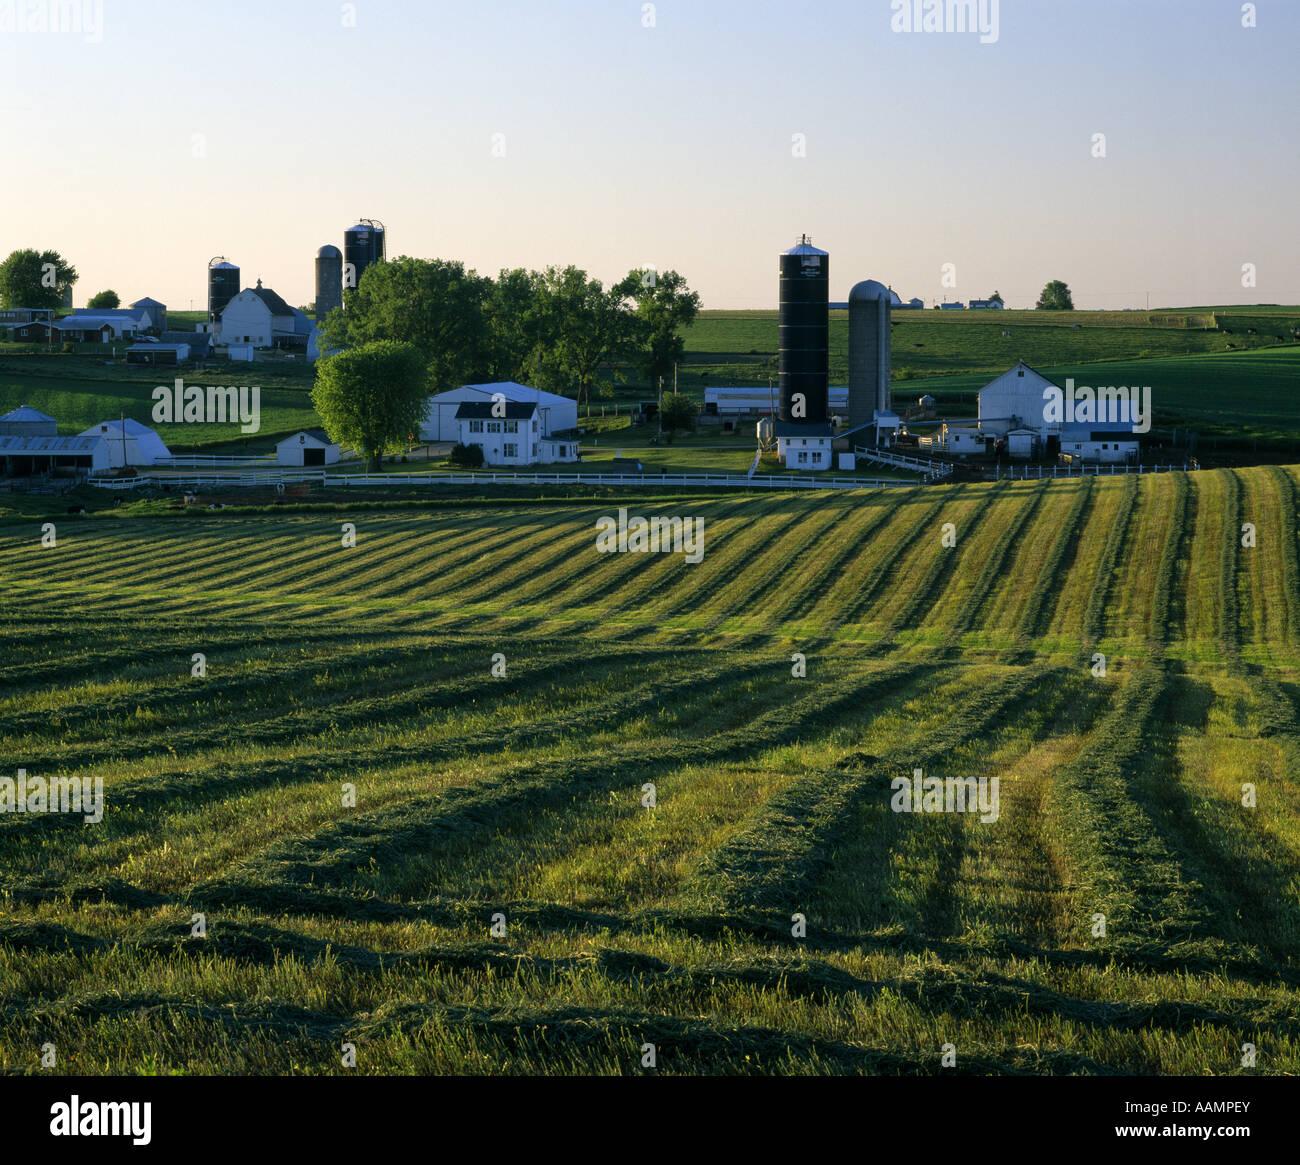 Wisconsin Dairy Farm Silos Barns Stock Photos & Wisconsin